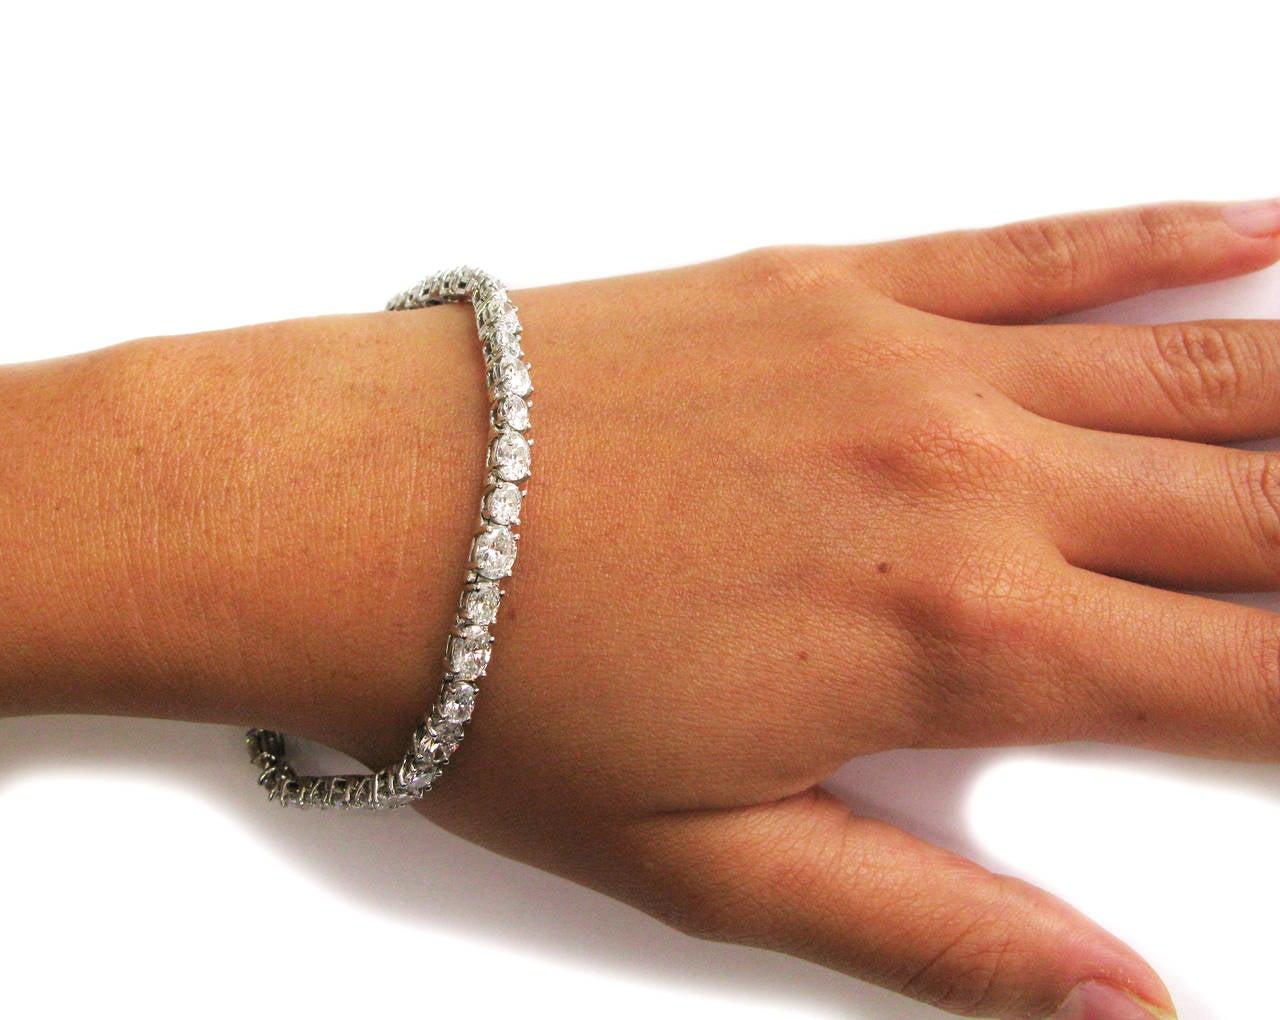 Oval Diamond Platinum Tennis Bracelet For Sale at 1stdibs